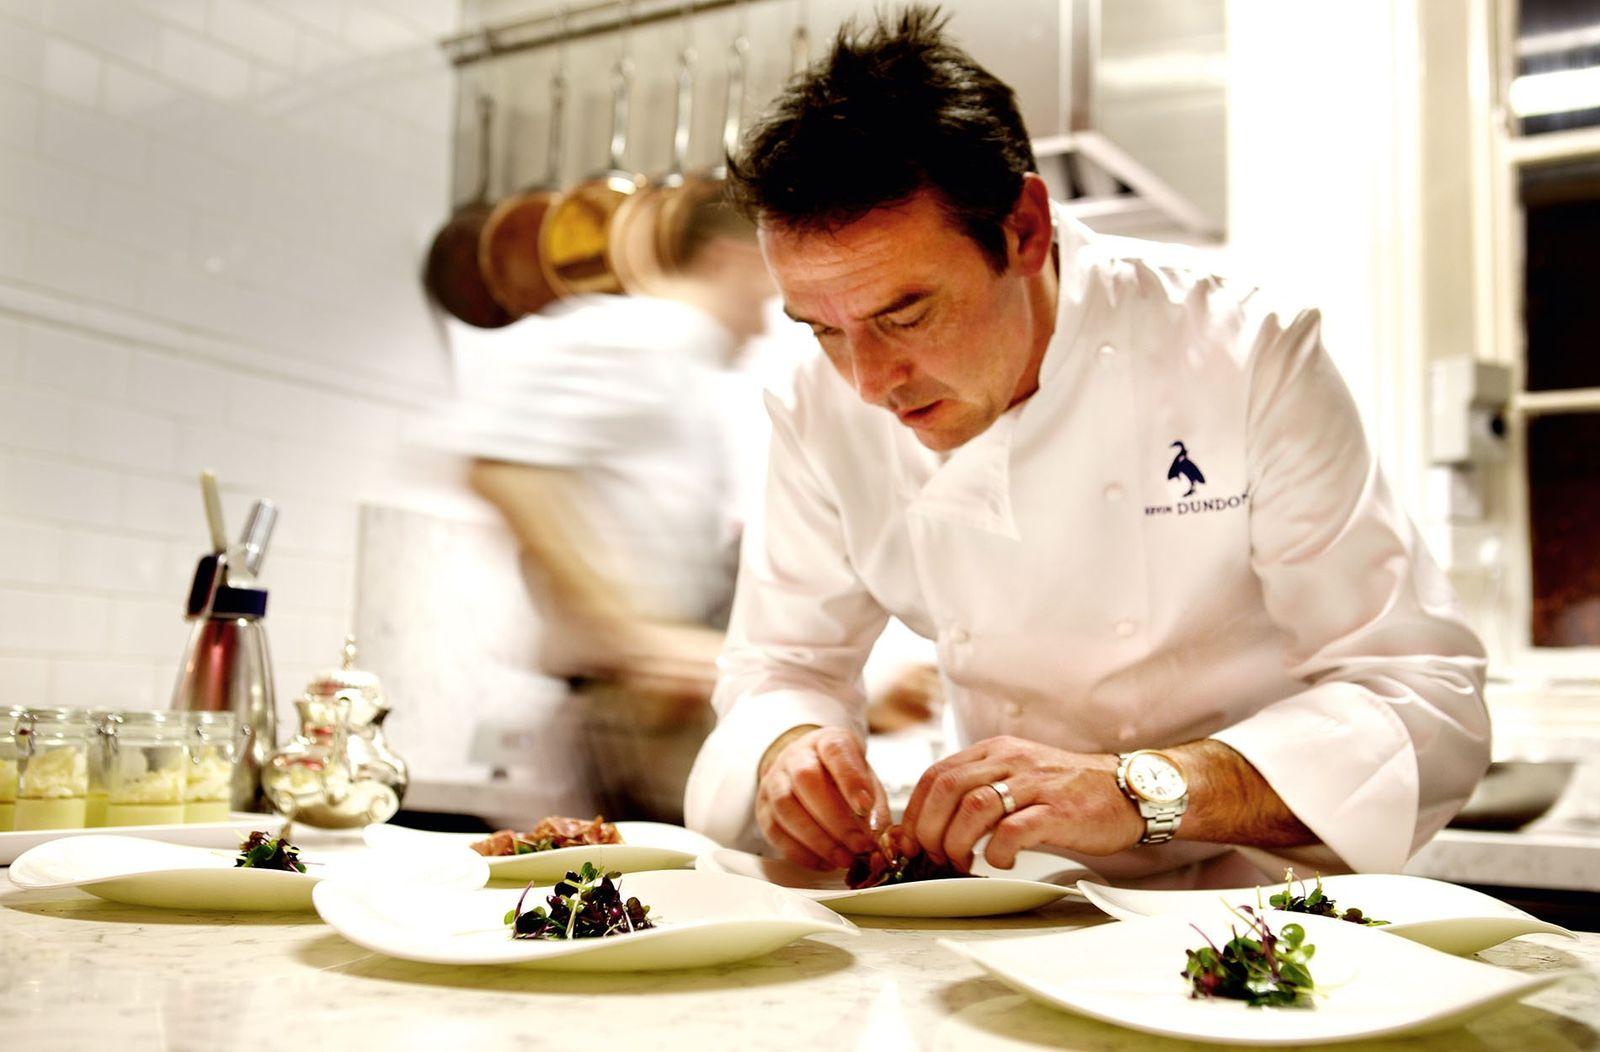 Chef Kevin Dundon plating up